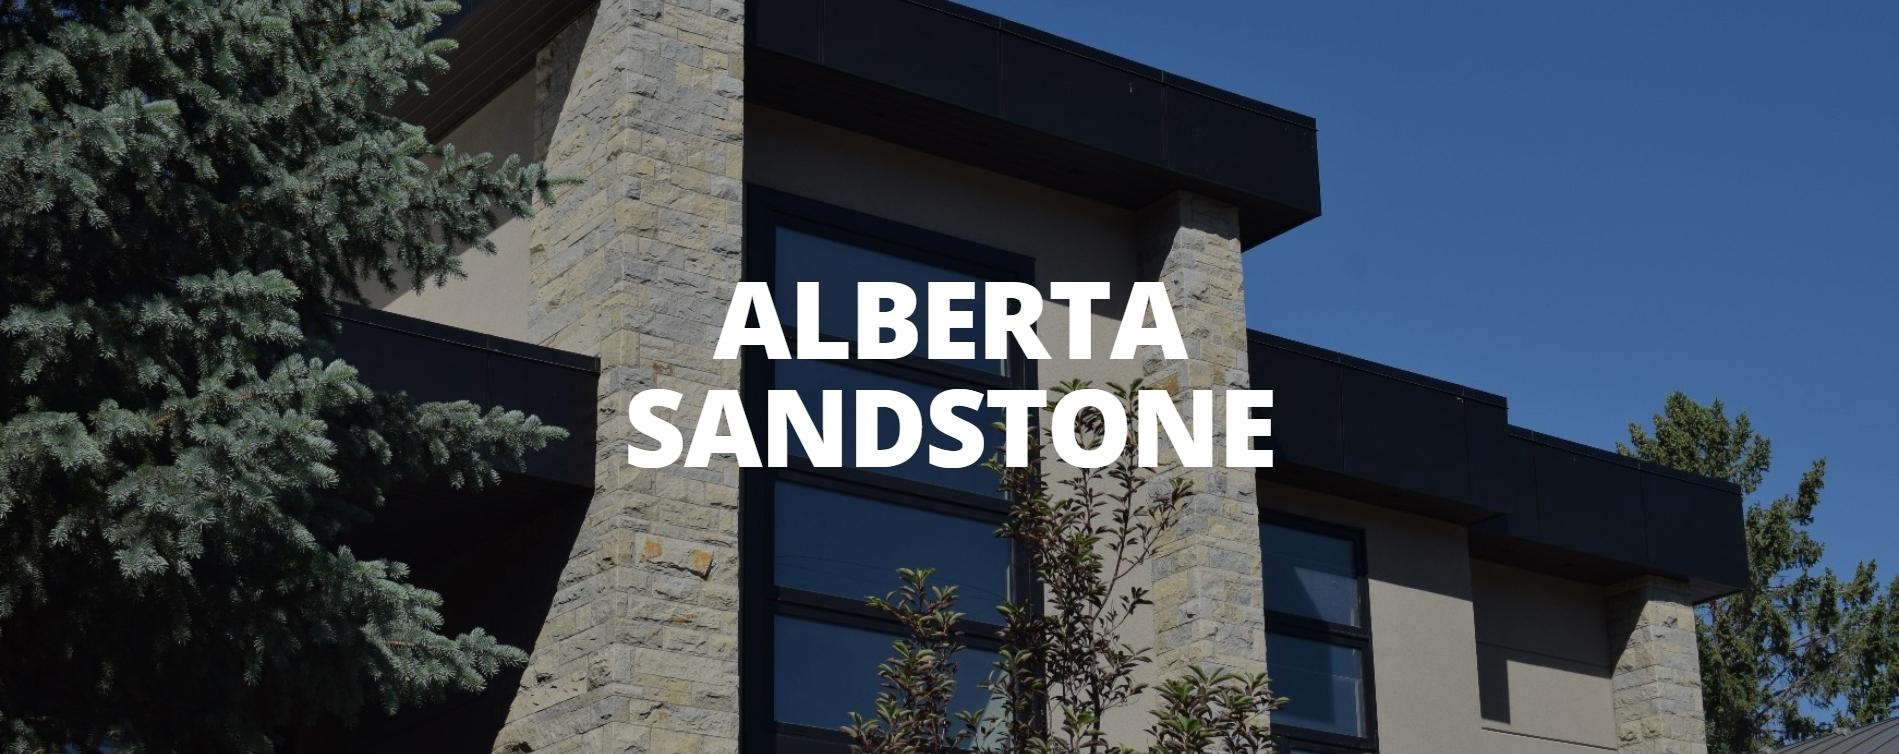 Alberta Sandstone